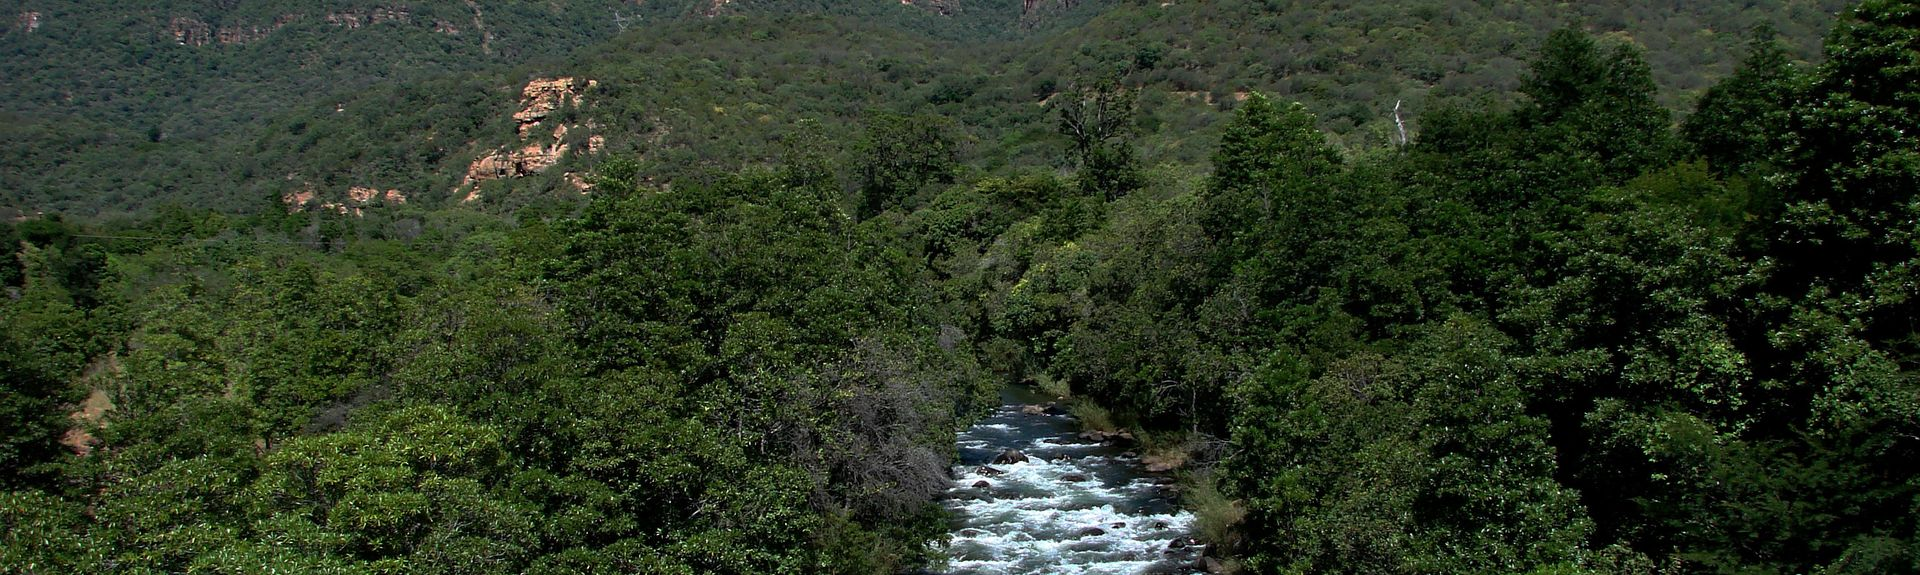 Hoedspruit Wildlife Estate, Hoedspruit, South Africa